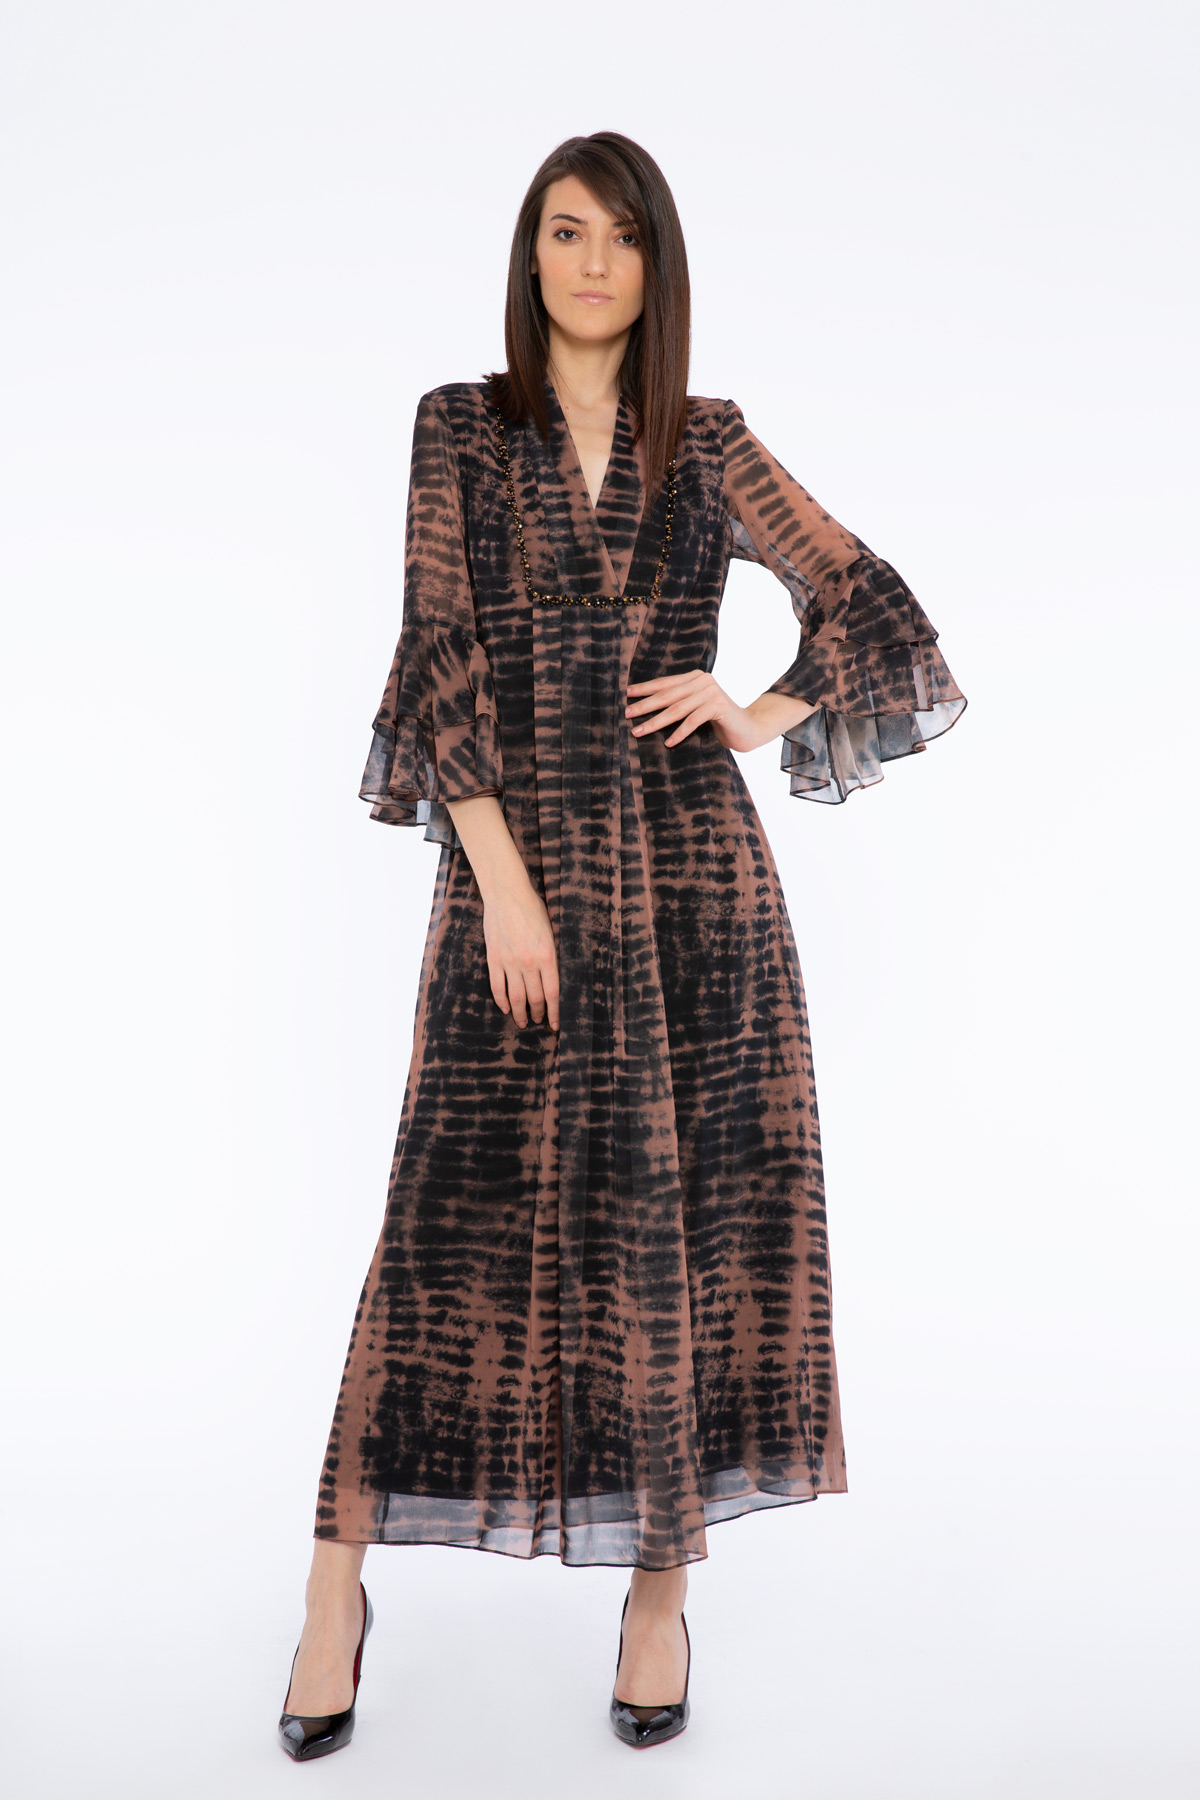 Stone Embroidered Batik Patterned Long Dress